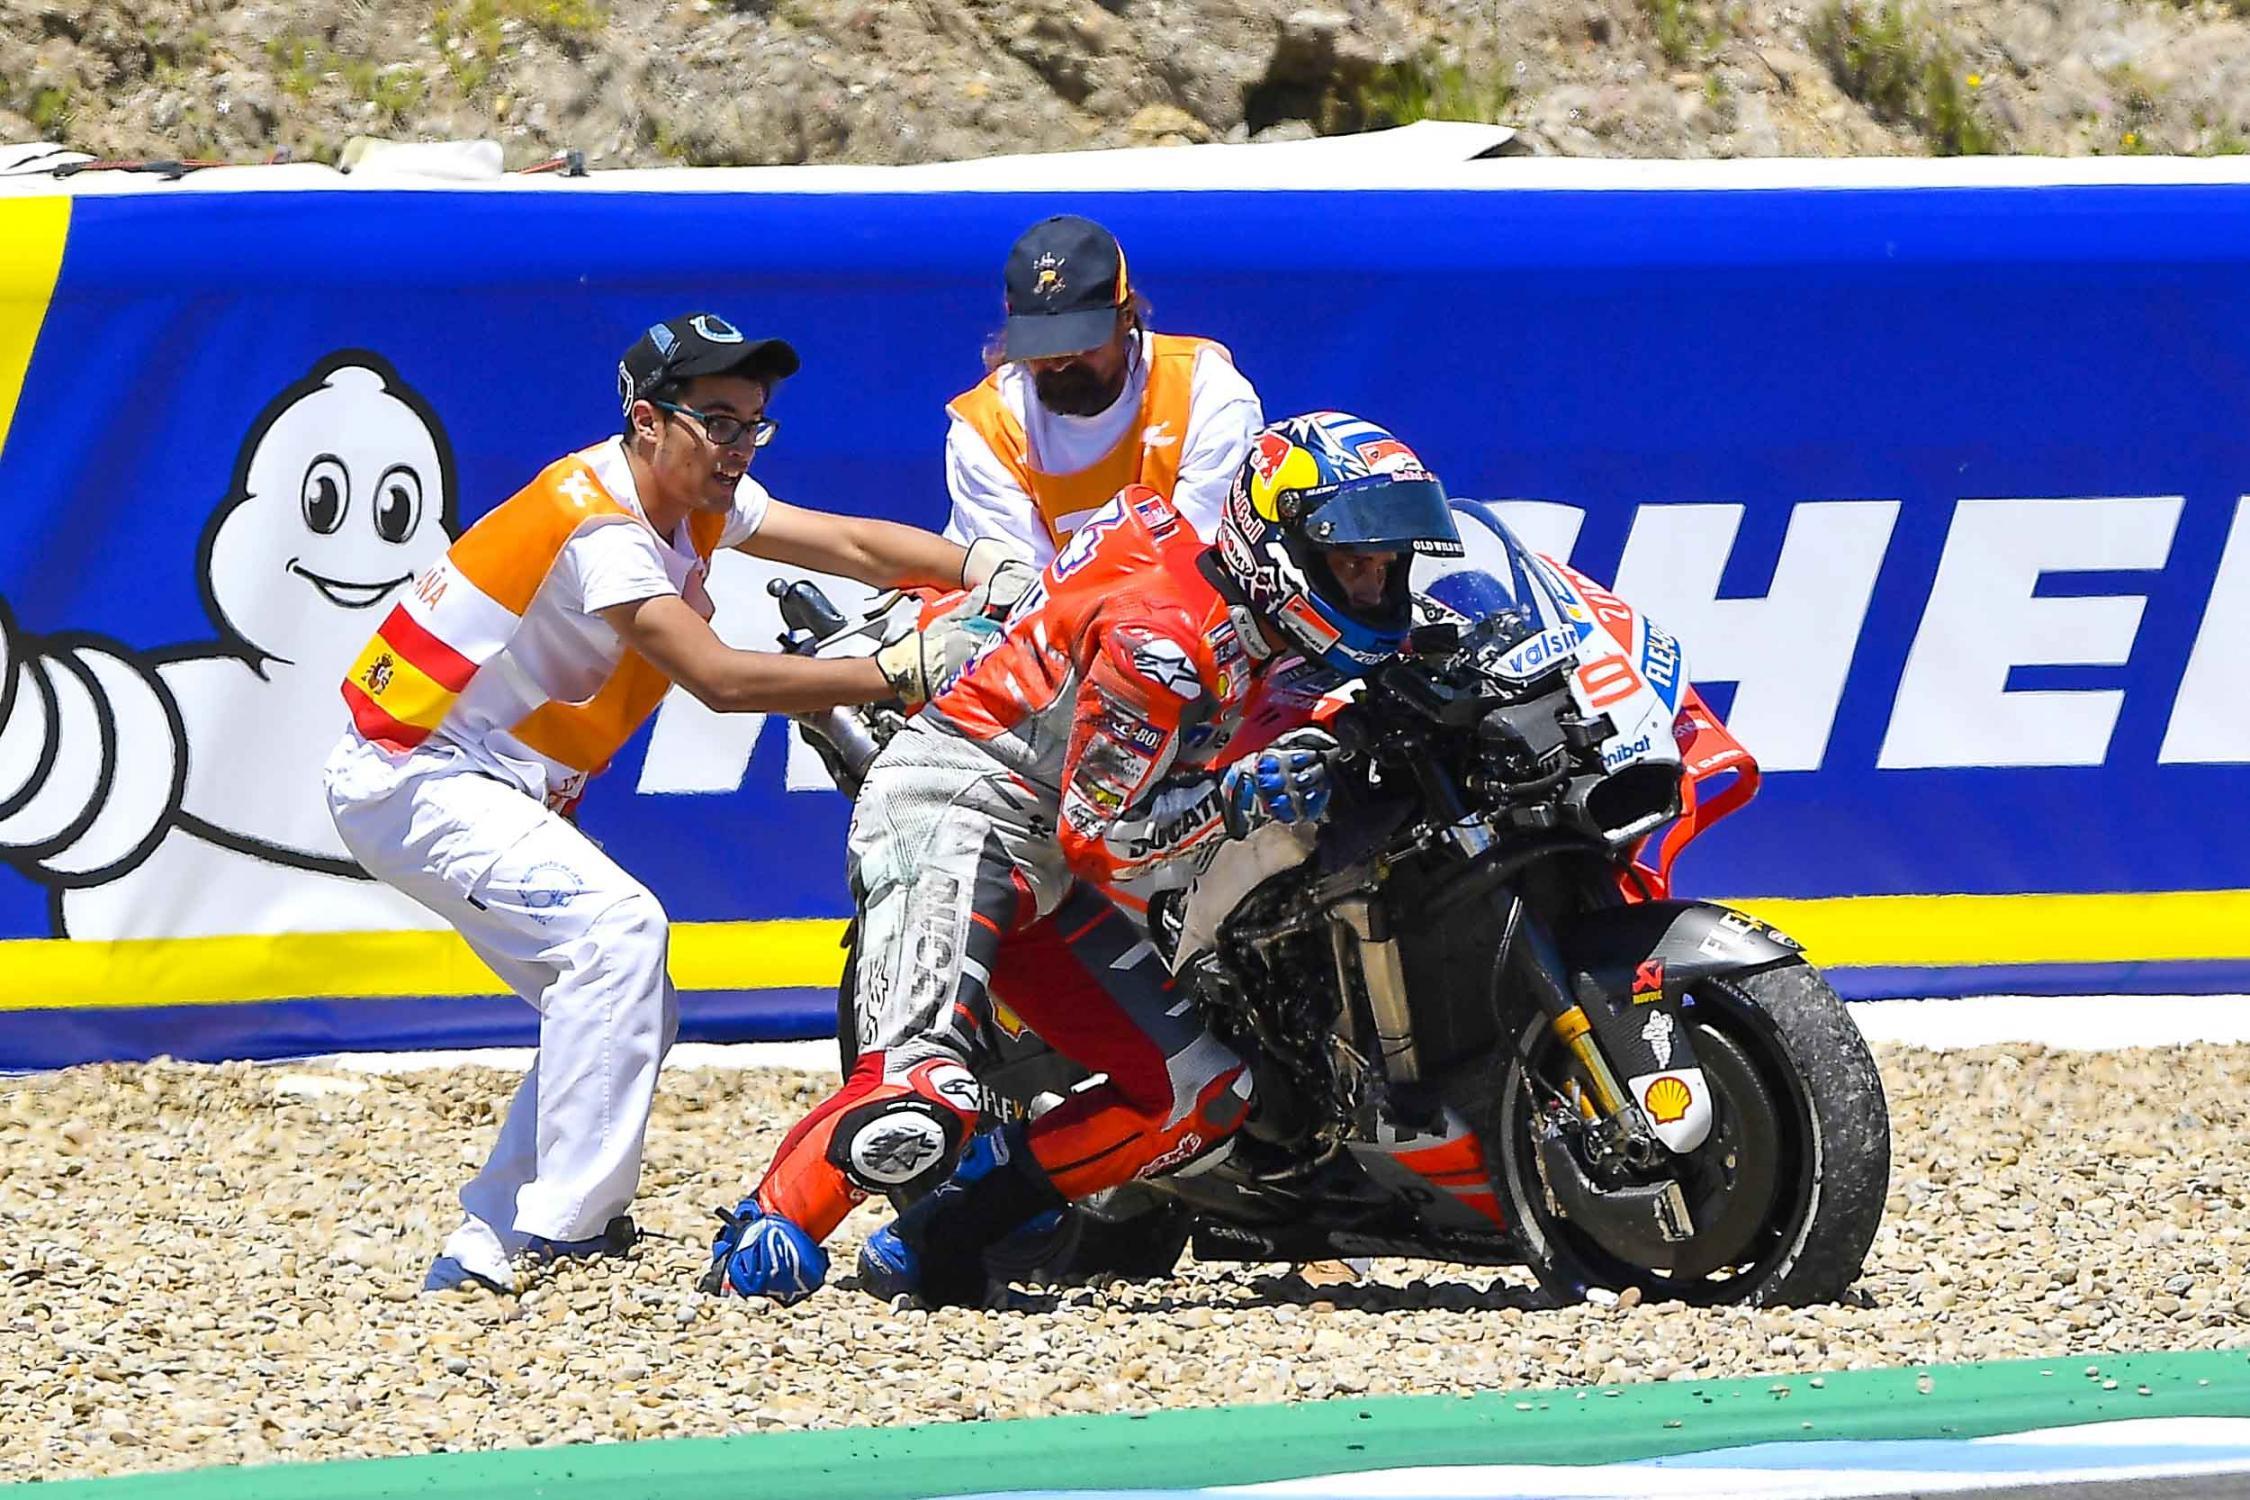 [GP] Jerez _tin6179_0.gallery_full_top_fullscreen